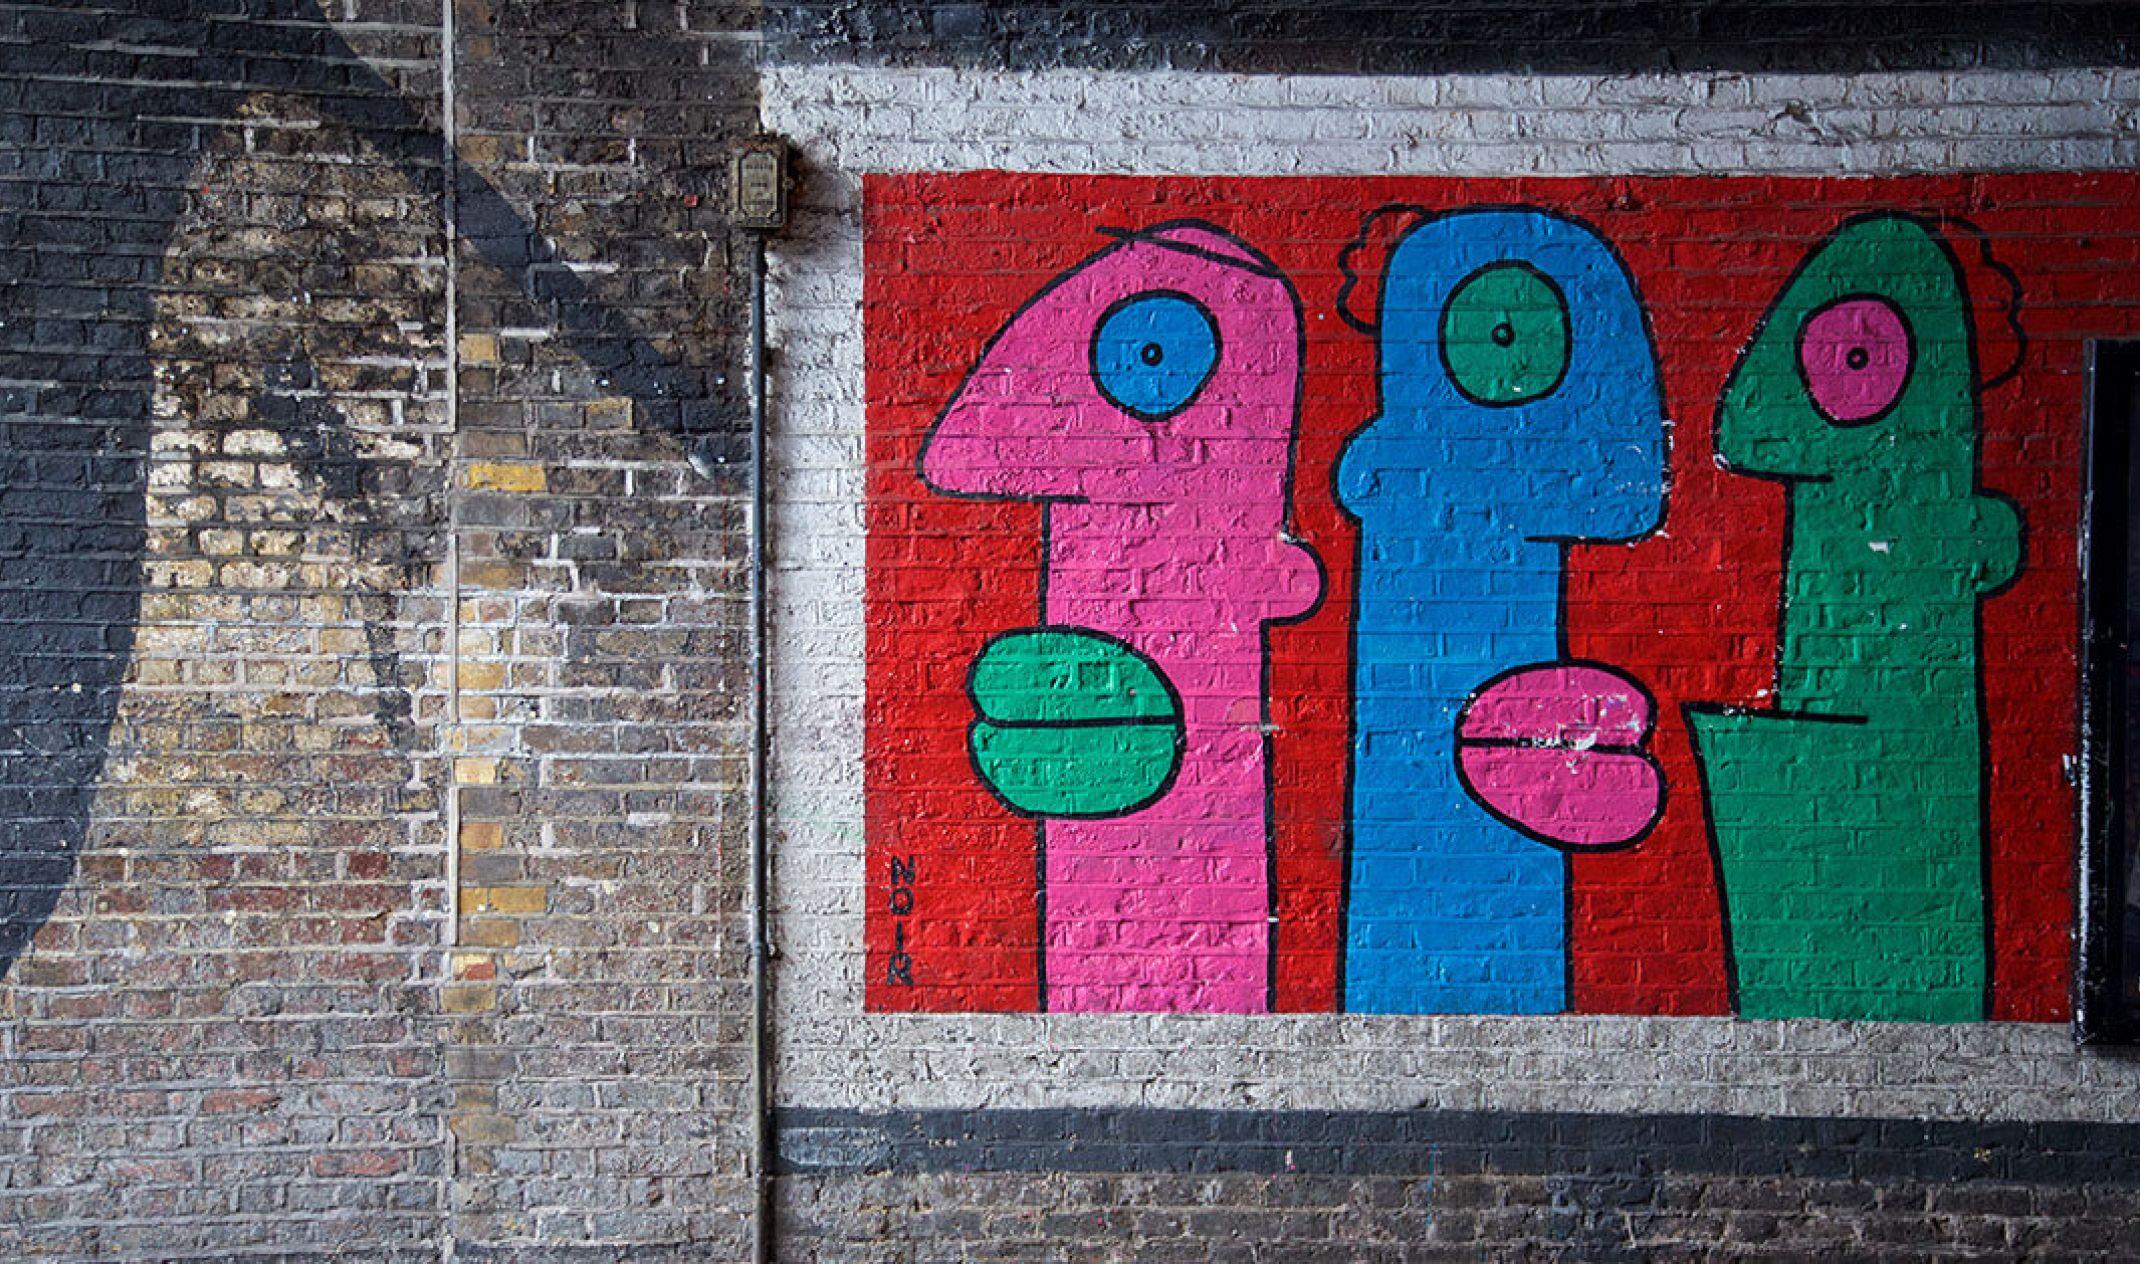 wall of graffiti with three heads